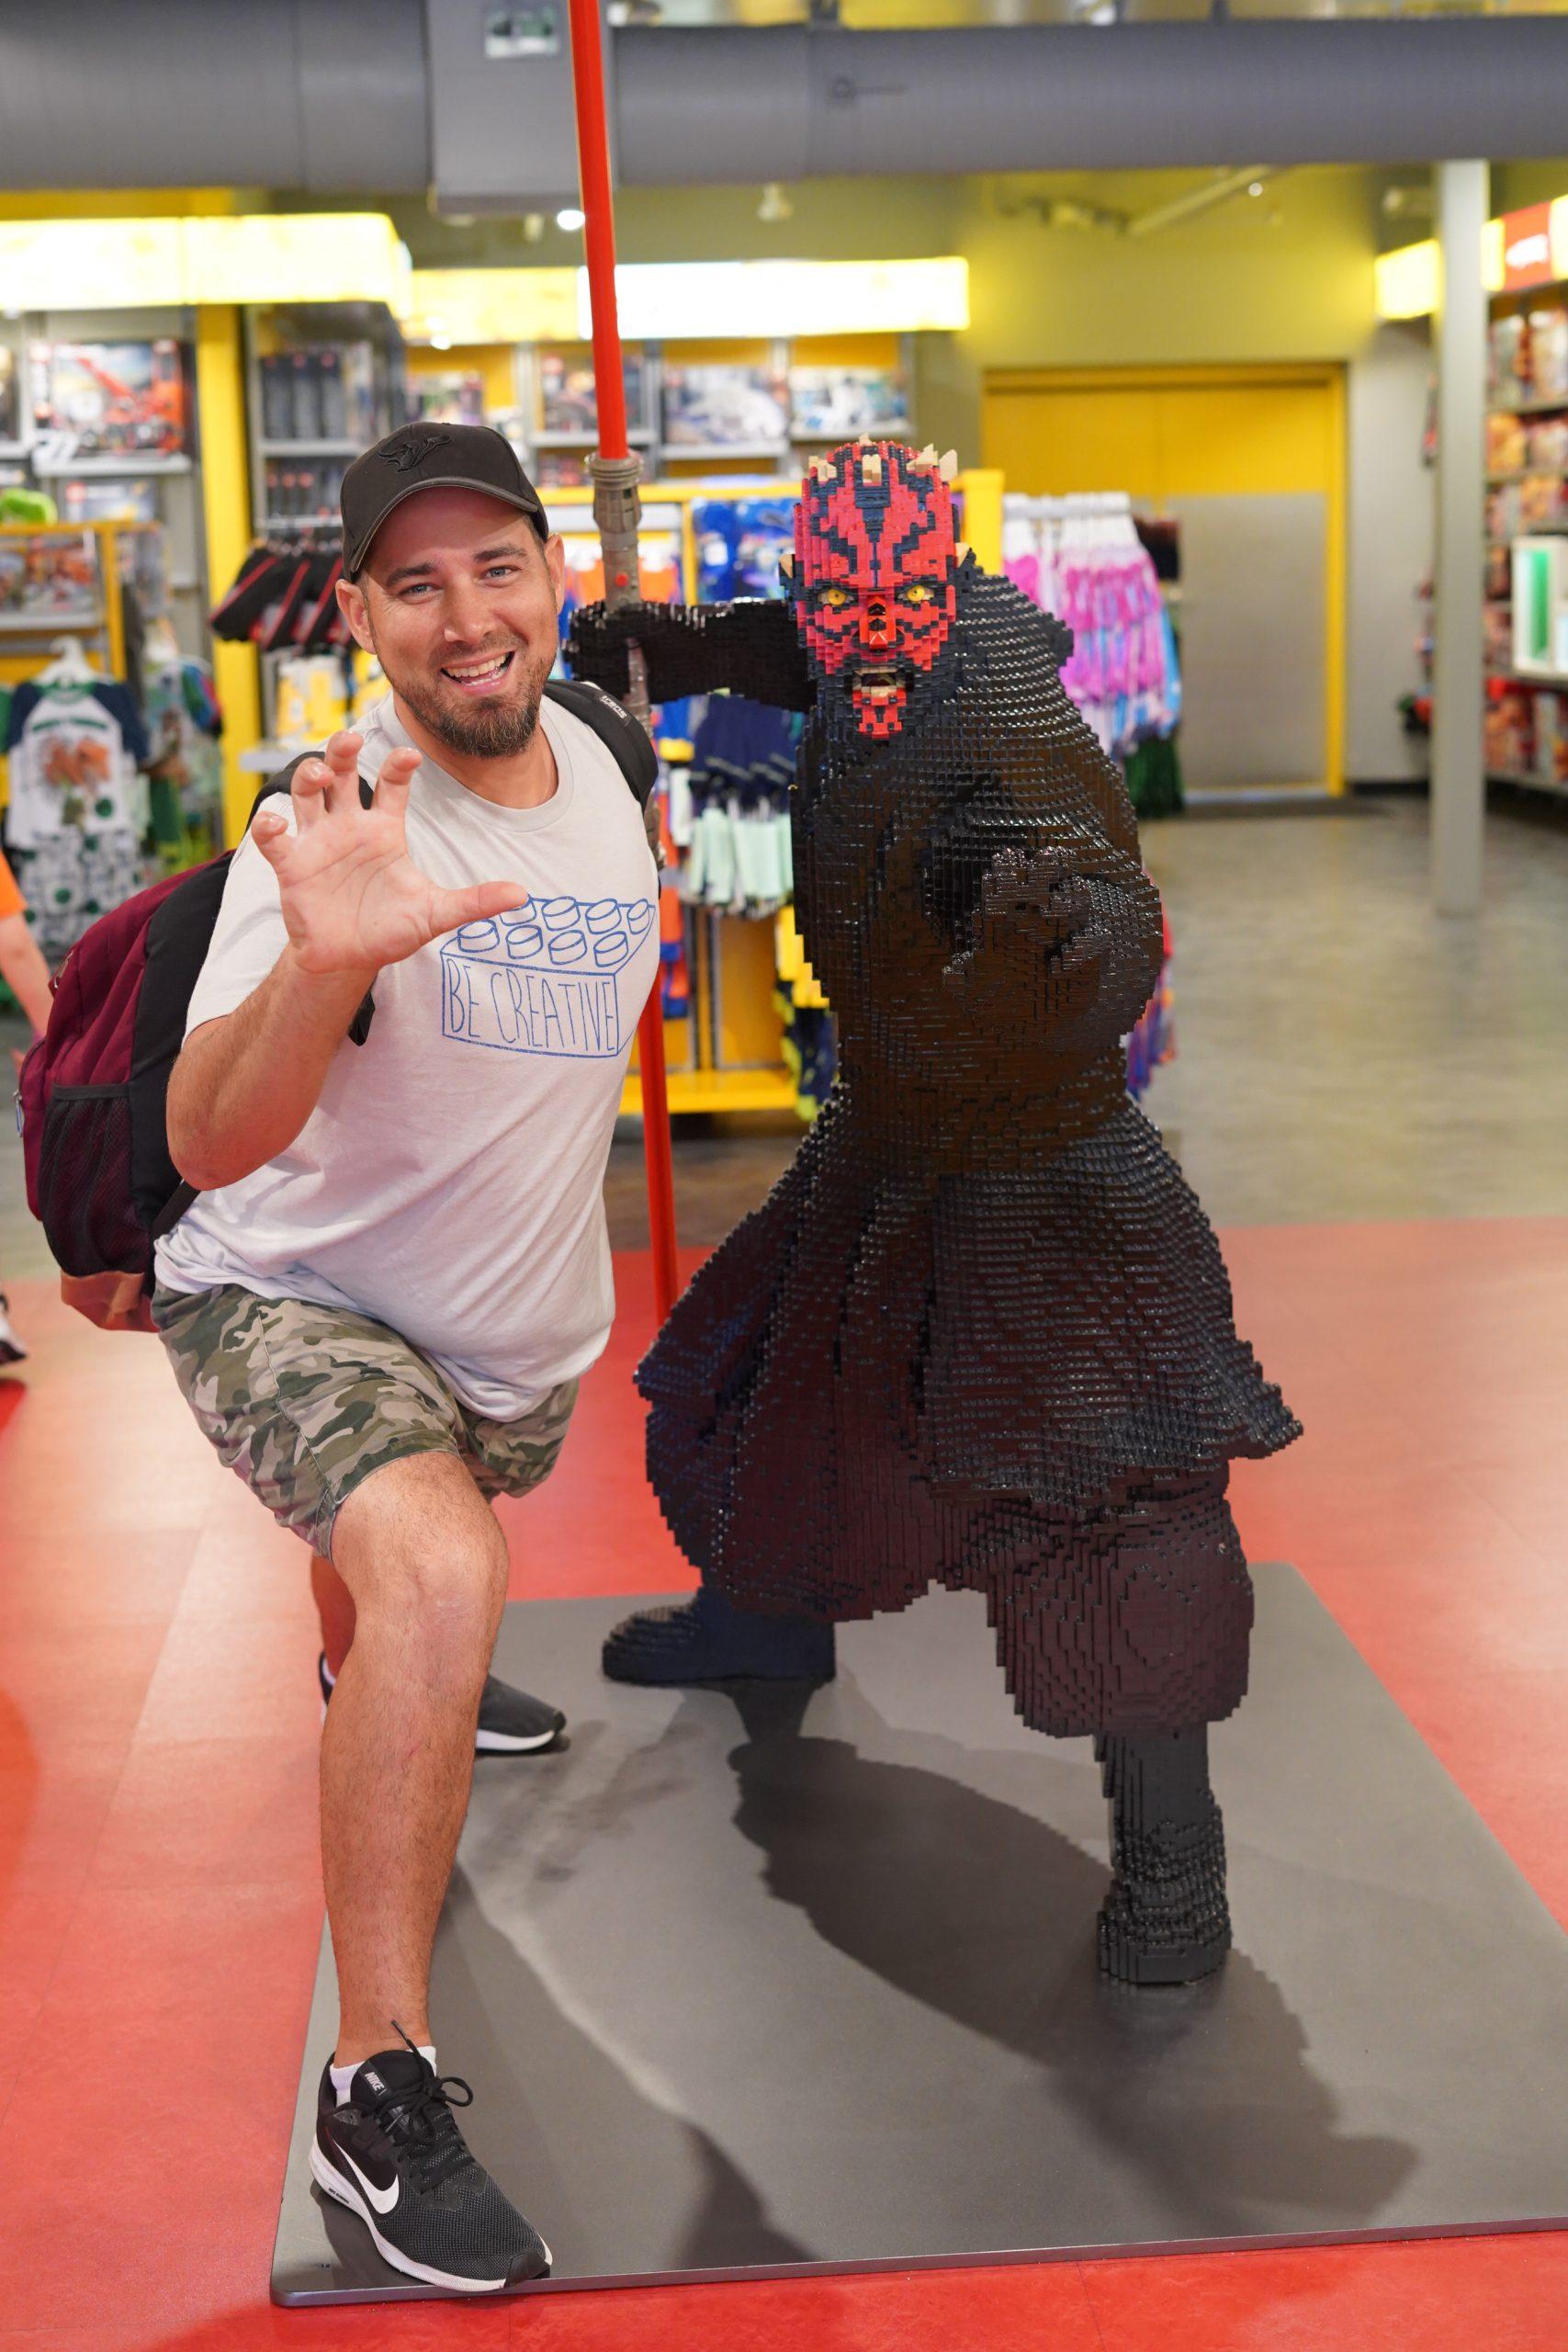 Man posing with lego Star Wars figurine at LEGOLAND. | Guide to LEGOLAND Florida